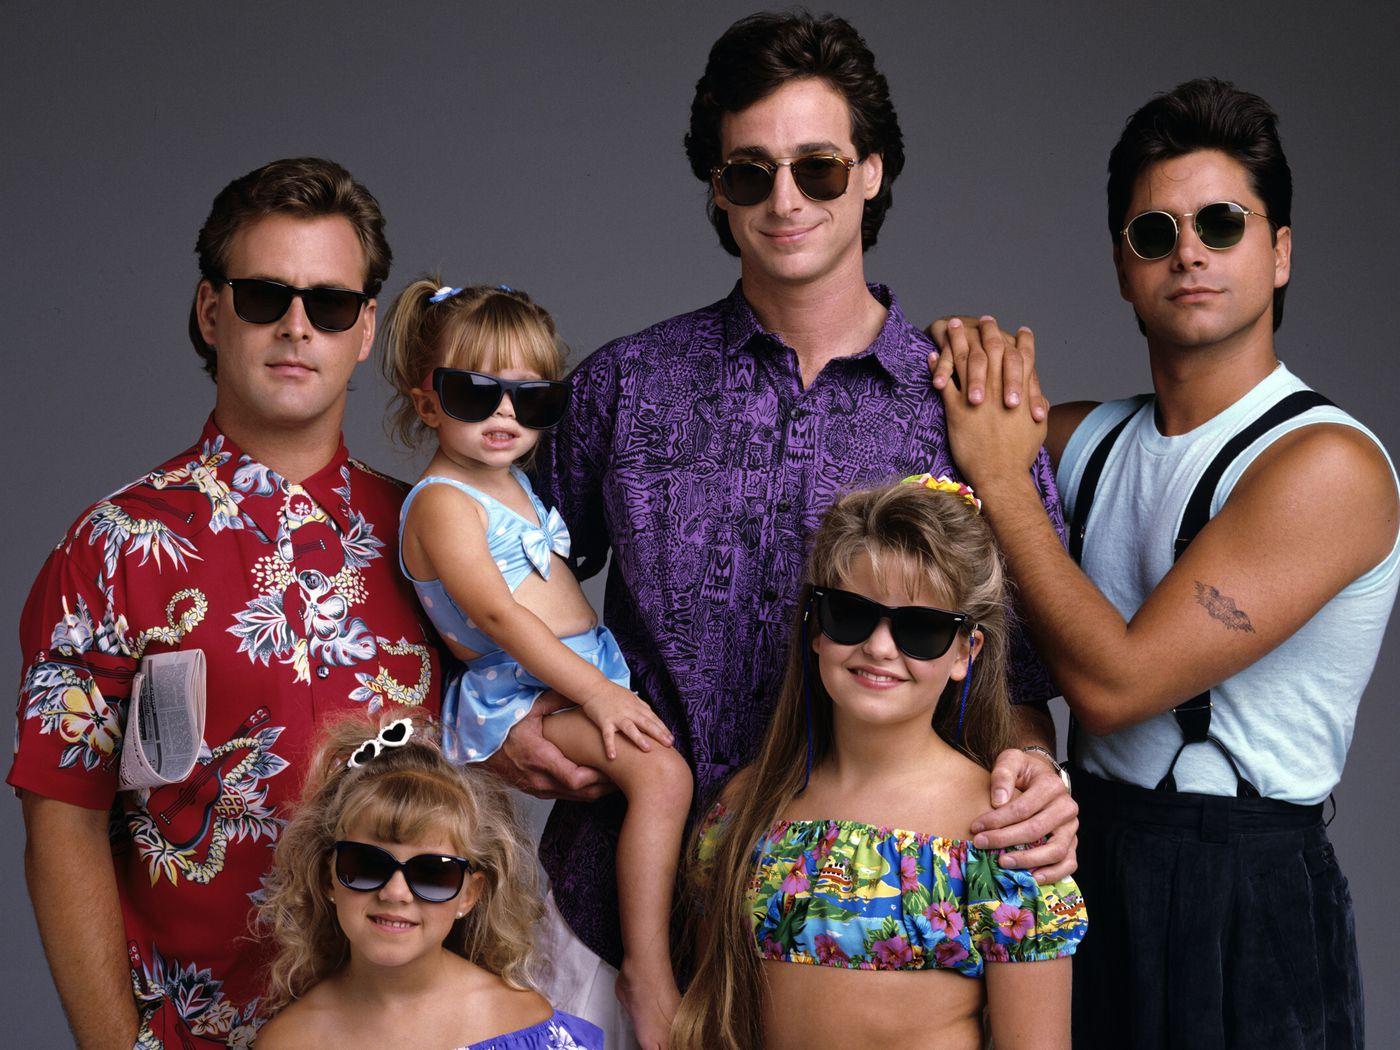 Bob Saget will return as Danny Tanner for Full House reboot - The Verge